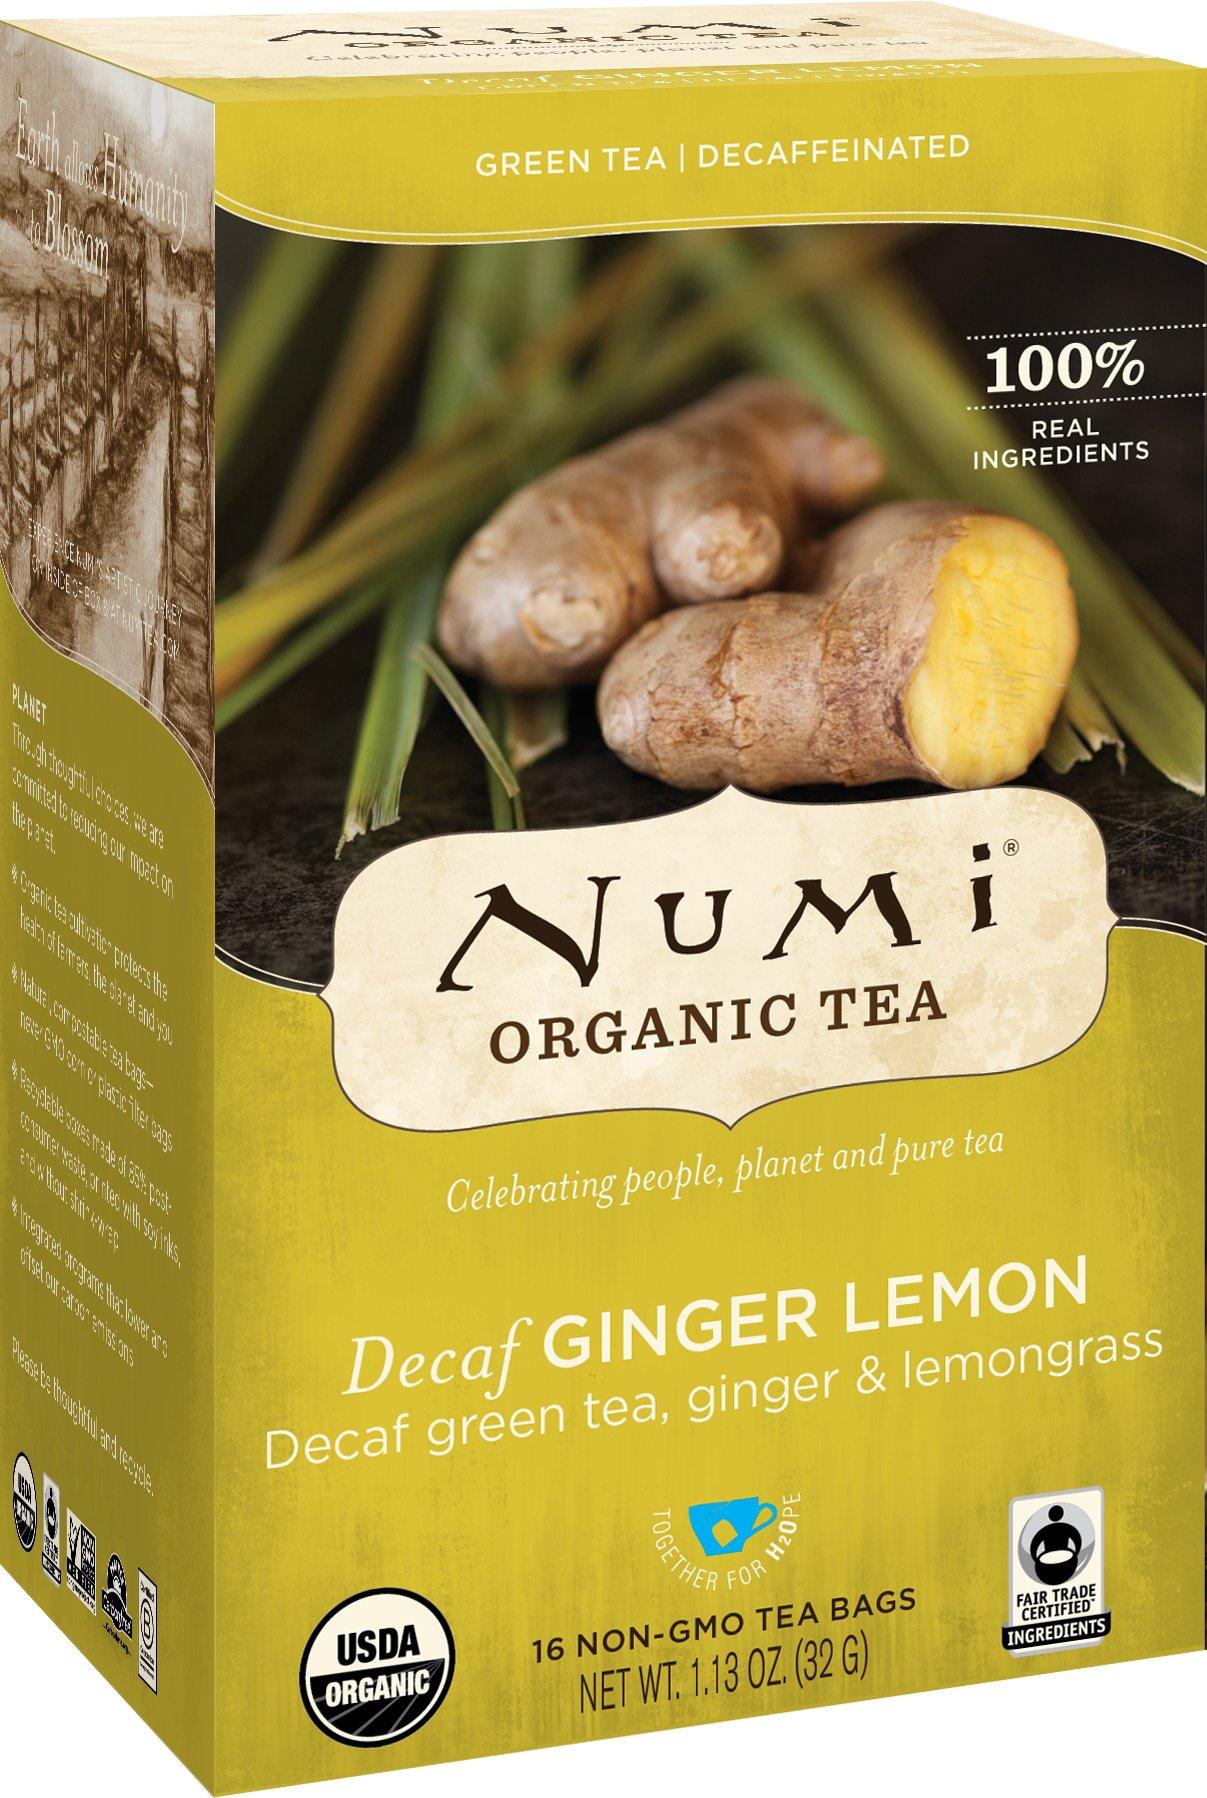 Numi Organic Tea - Decaf Ginger Lemon Decaffeinated Green Tea - Caffeine Free Natural Tea Blend - 16 Count non-GMO Tea Bags